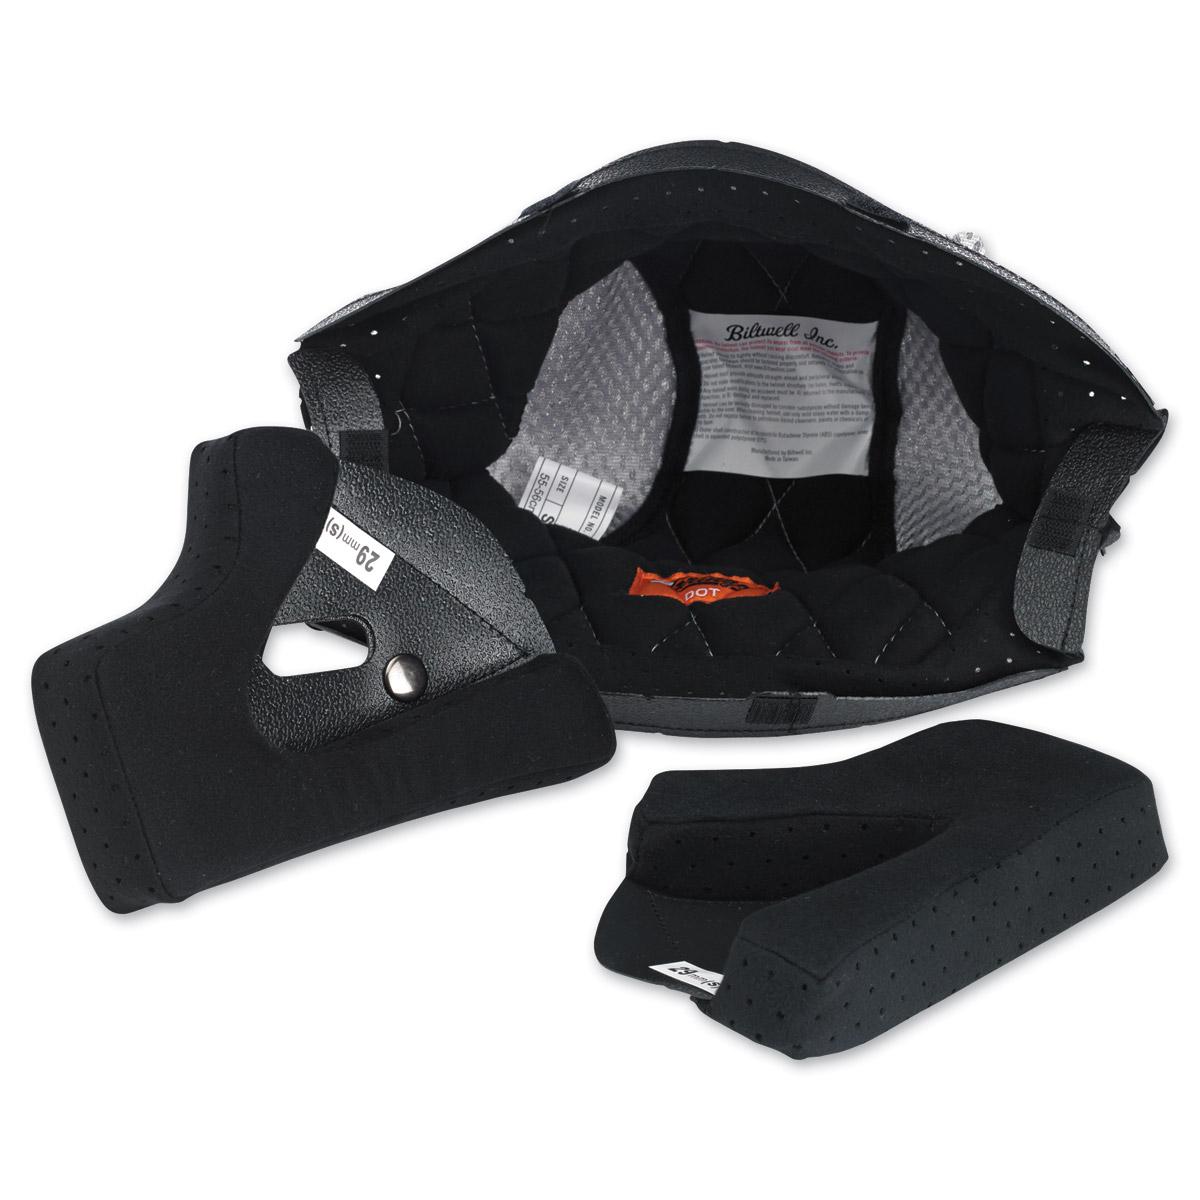 Biltwell Inc. Gringo/Gringo S Black/Silver Helmet Liner